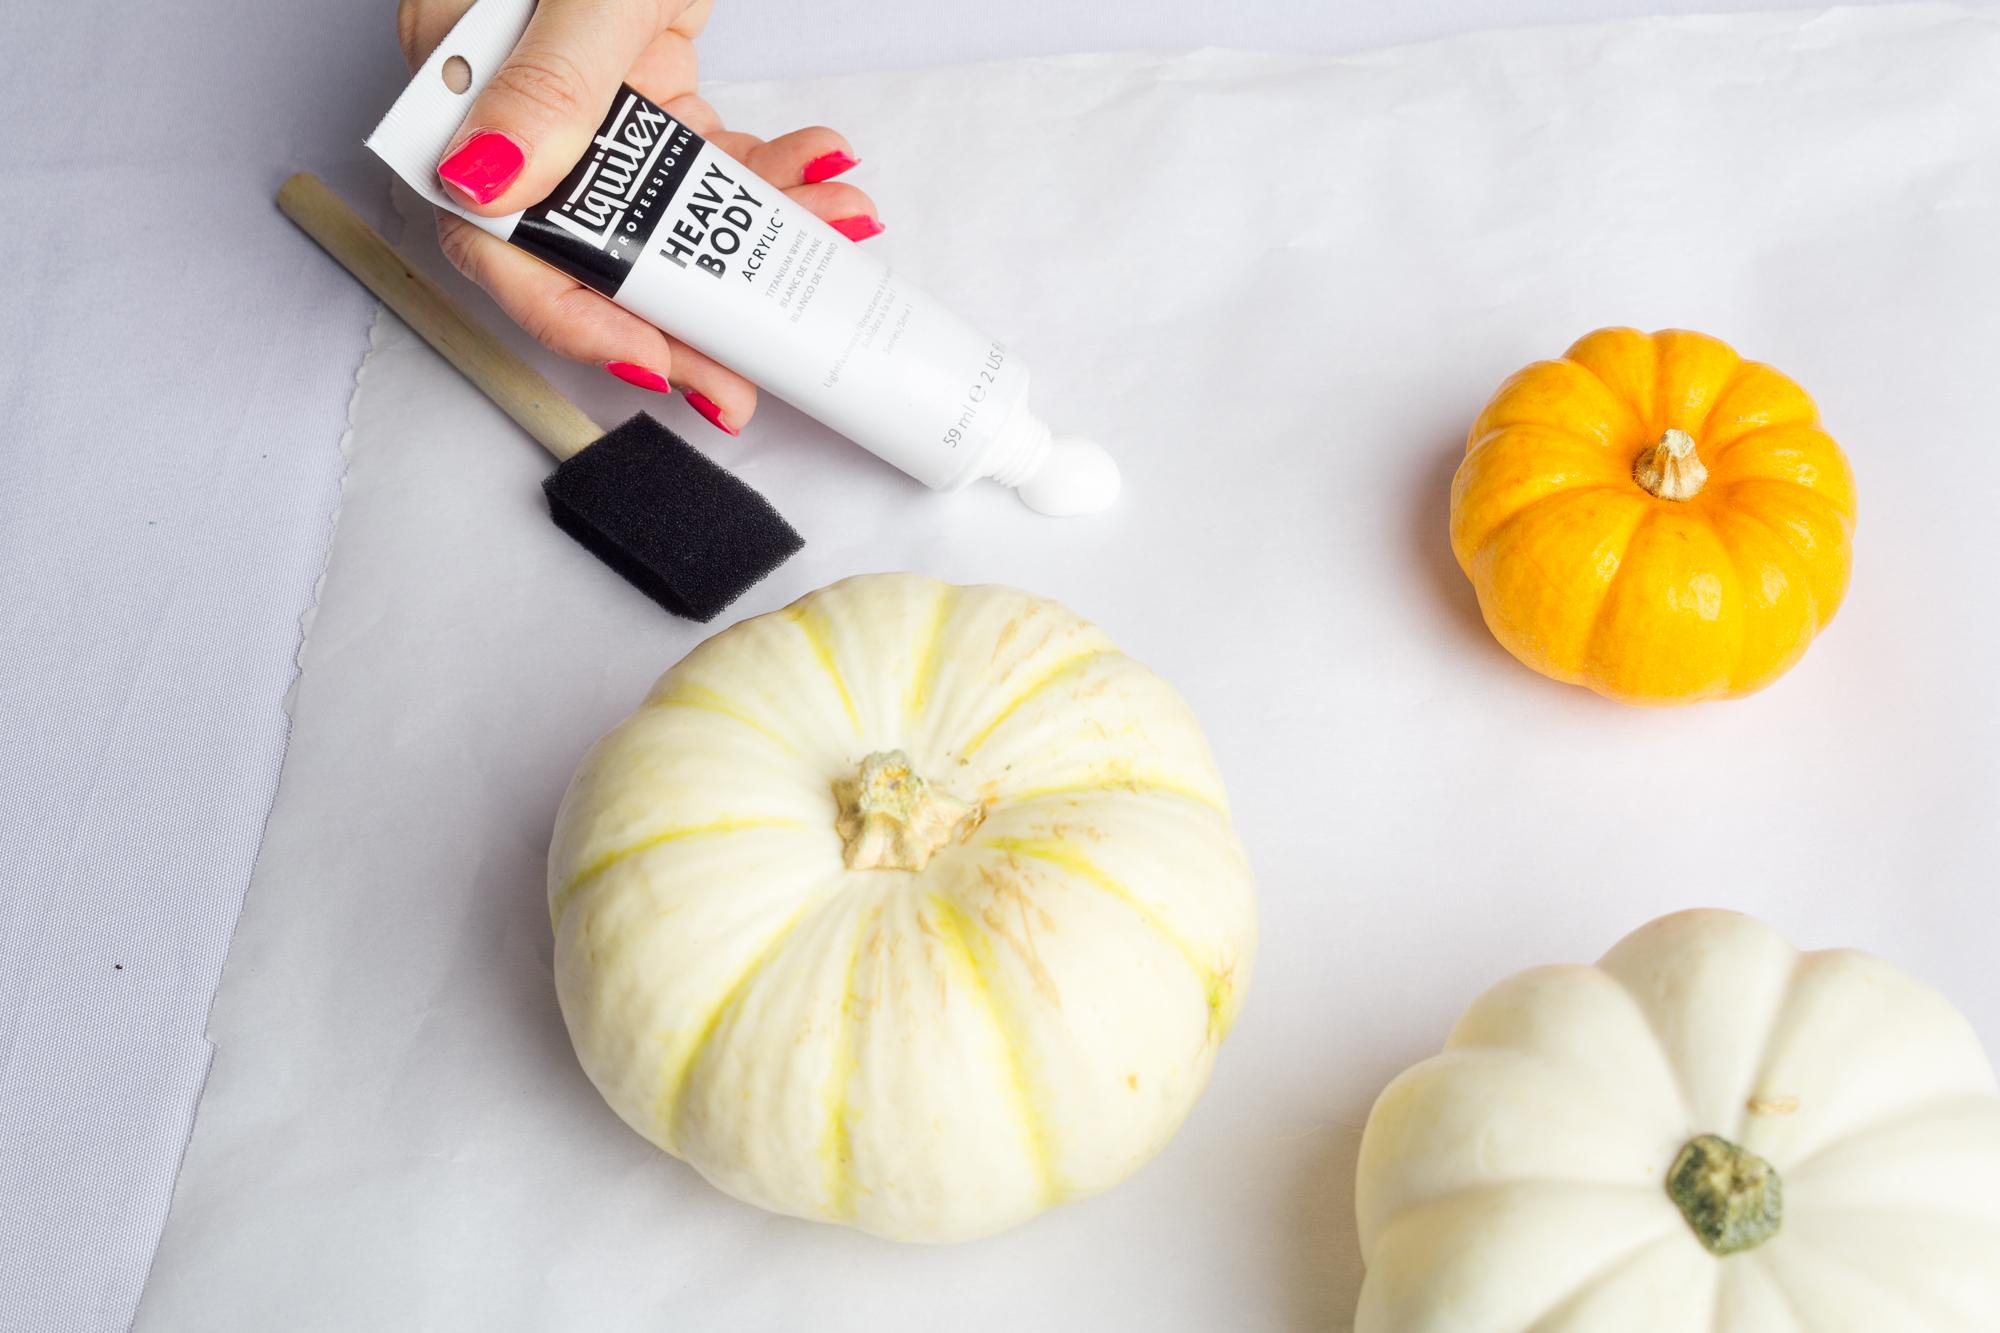 paint-the-pumpkins-diy-marbled-pumpkins